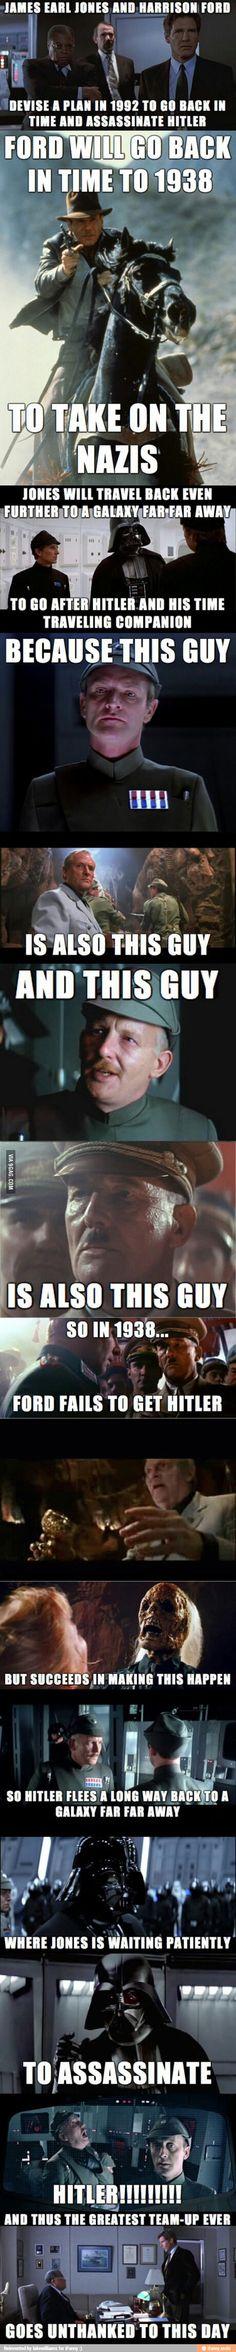 Let's kill Hitler